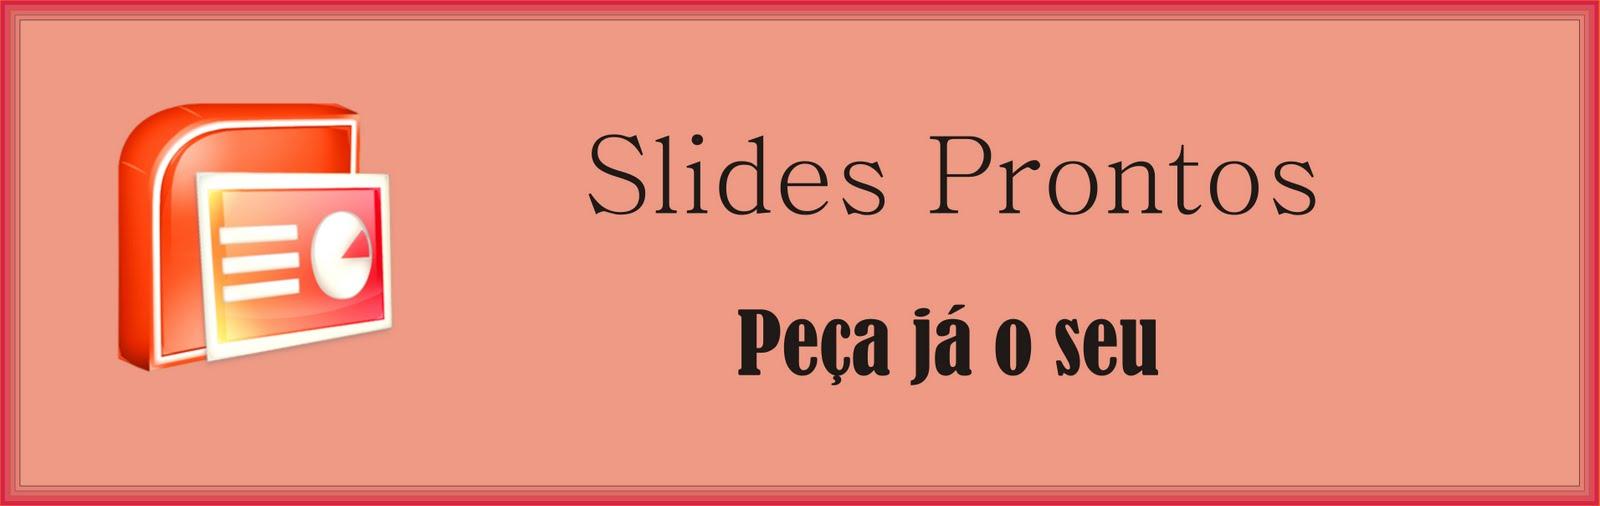 Slides Prontos